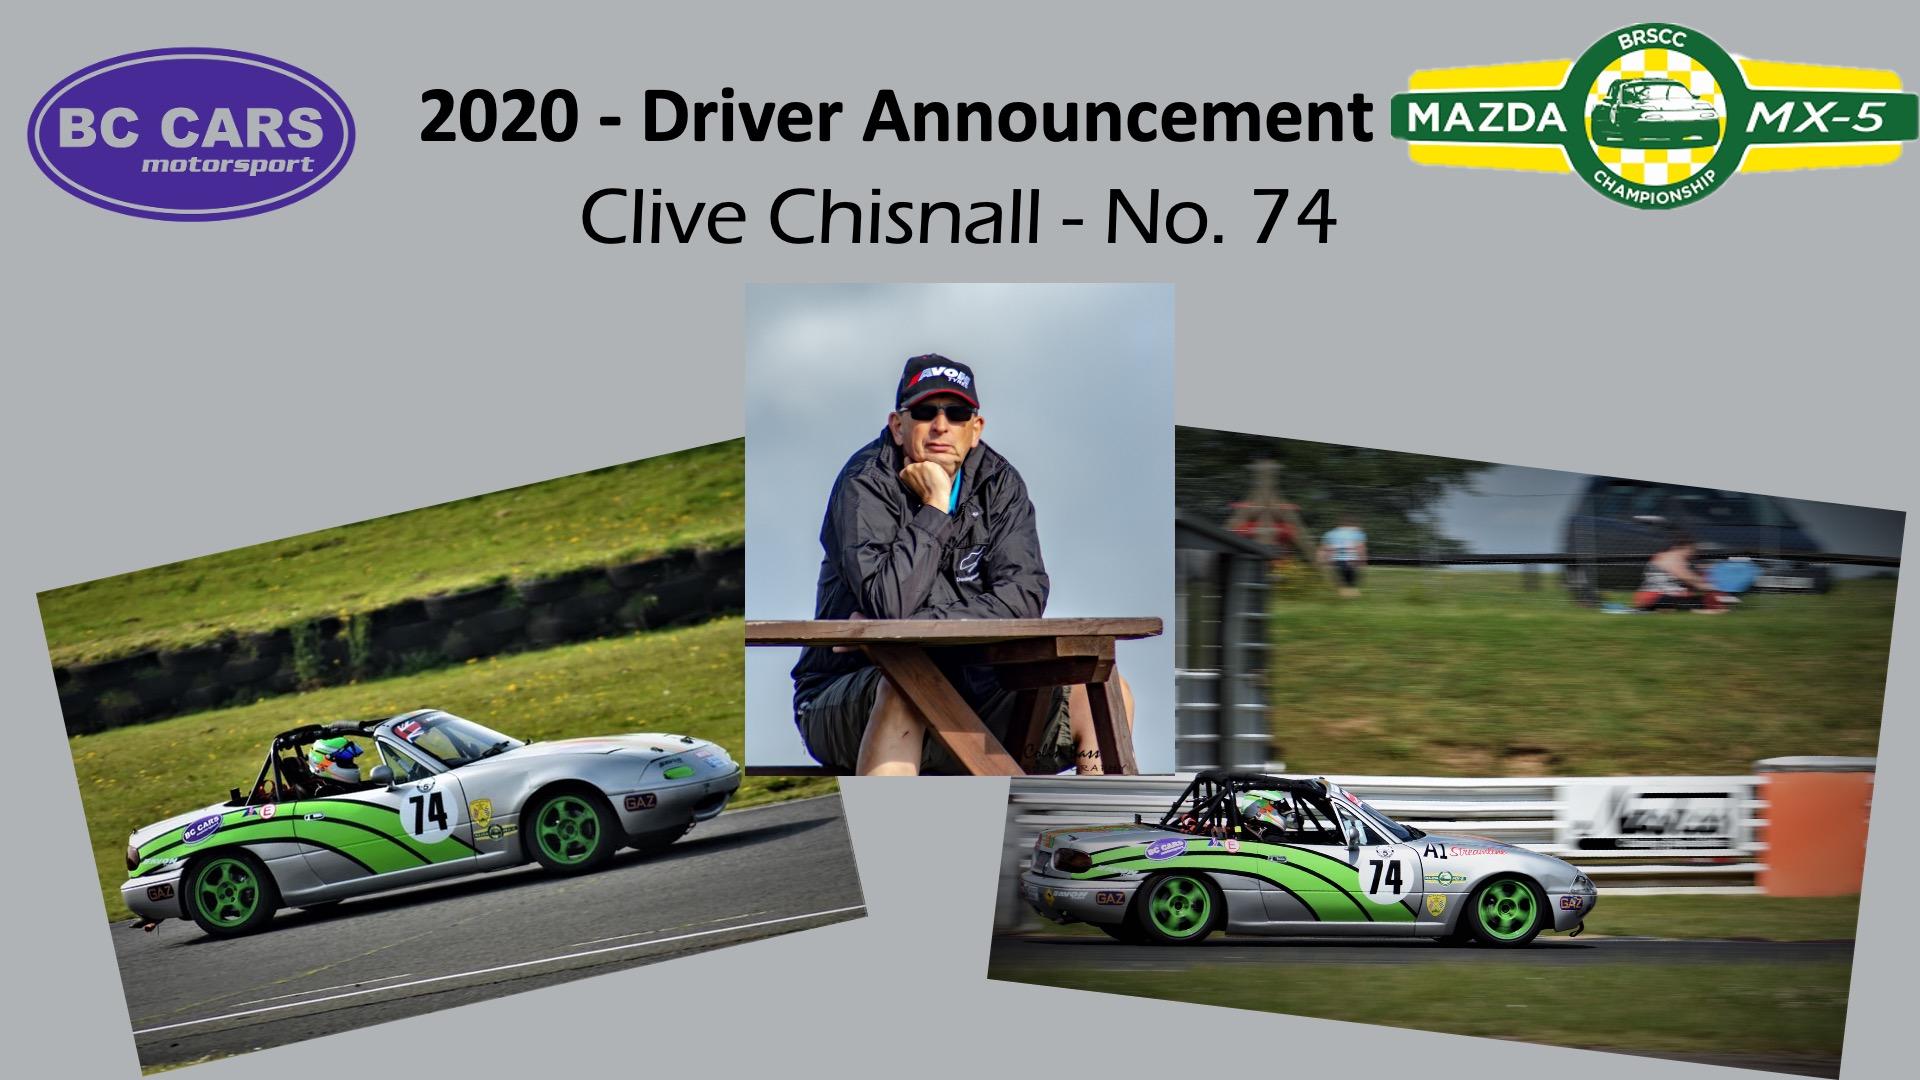 Driver Profile - Clive Chisnall